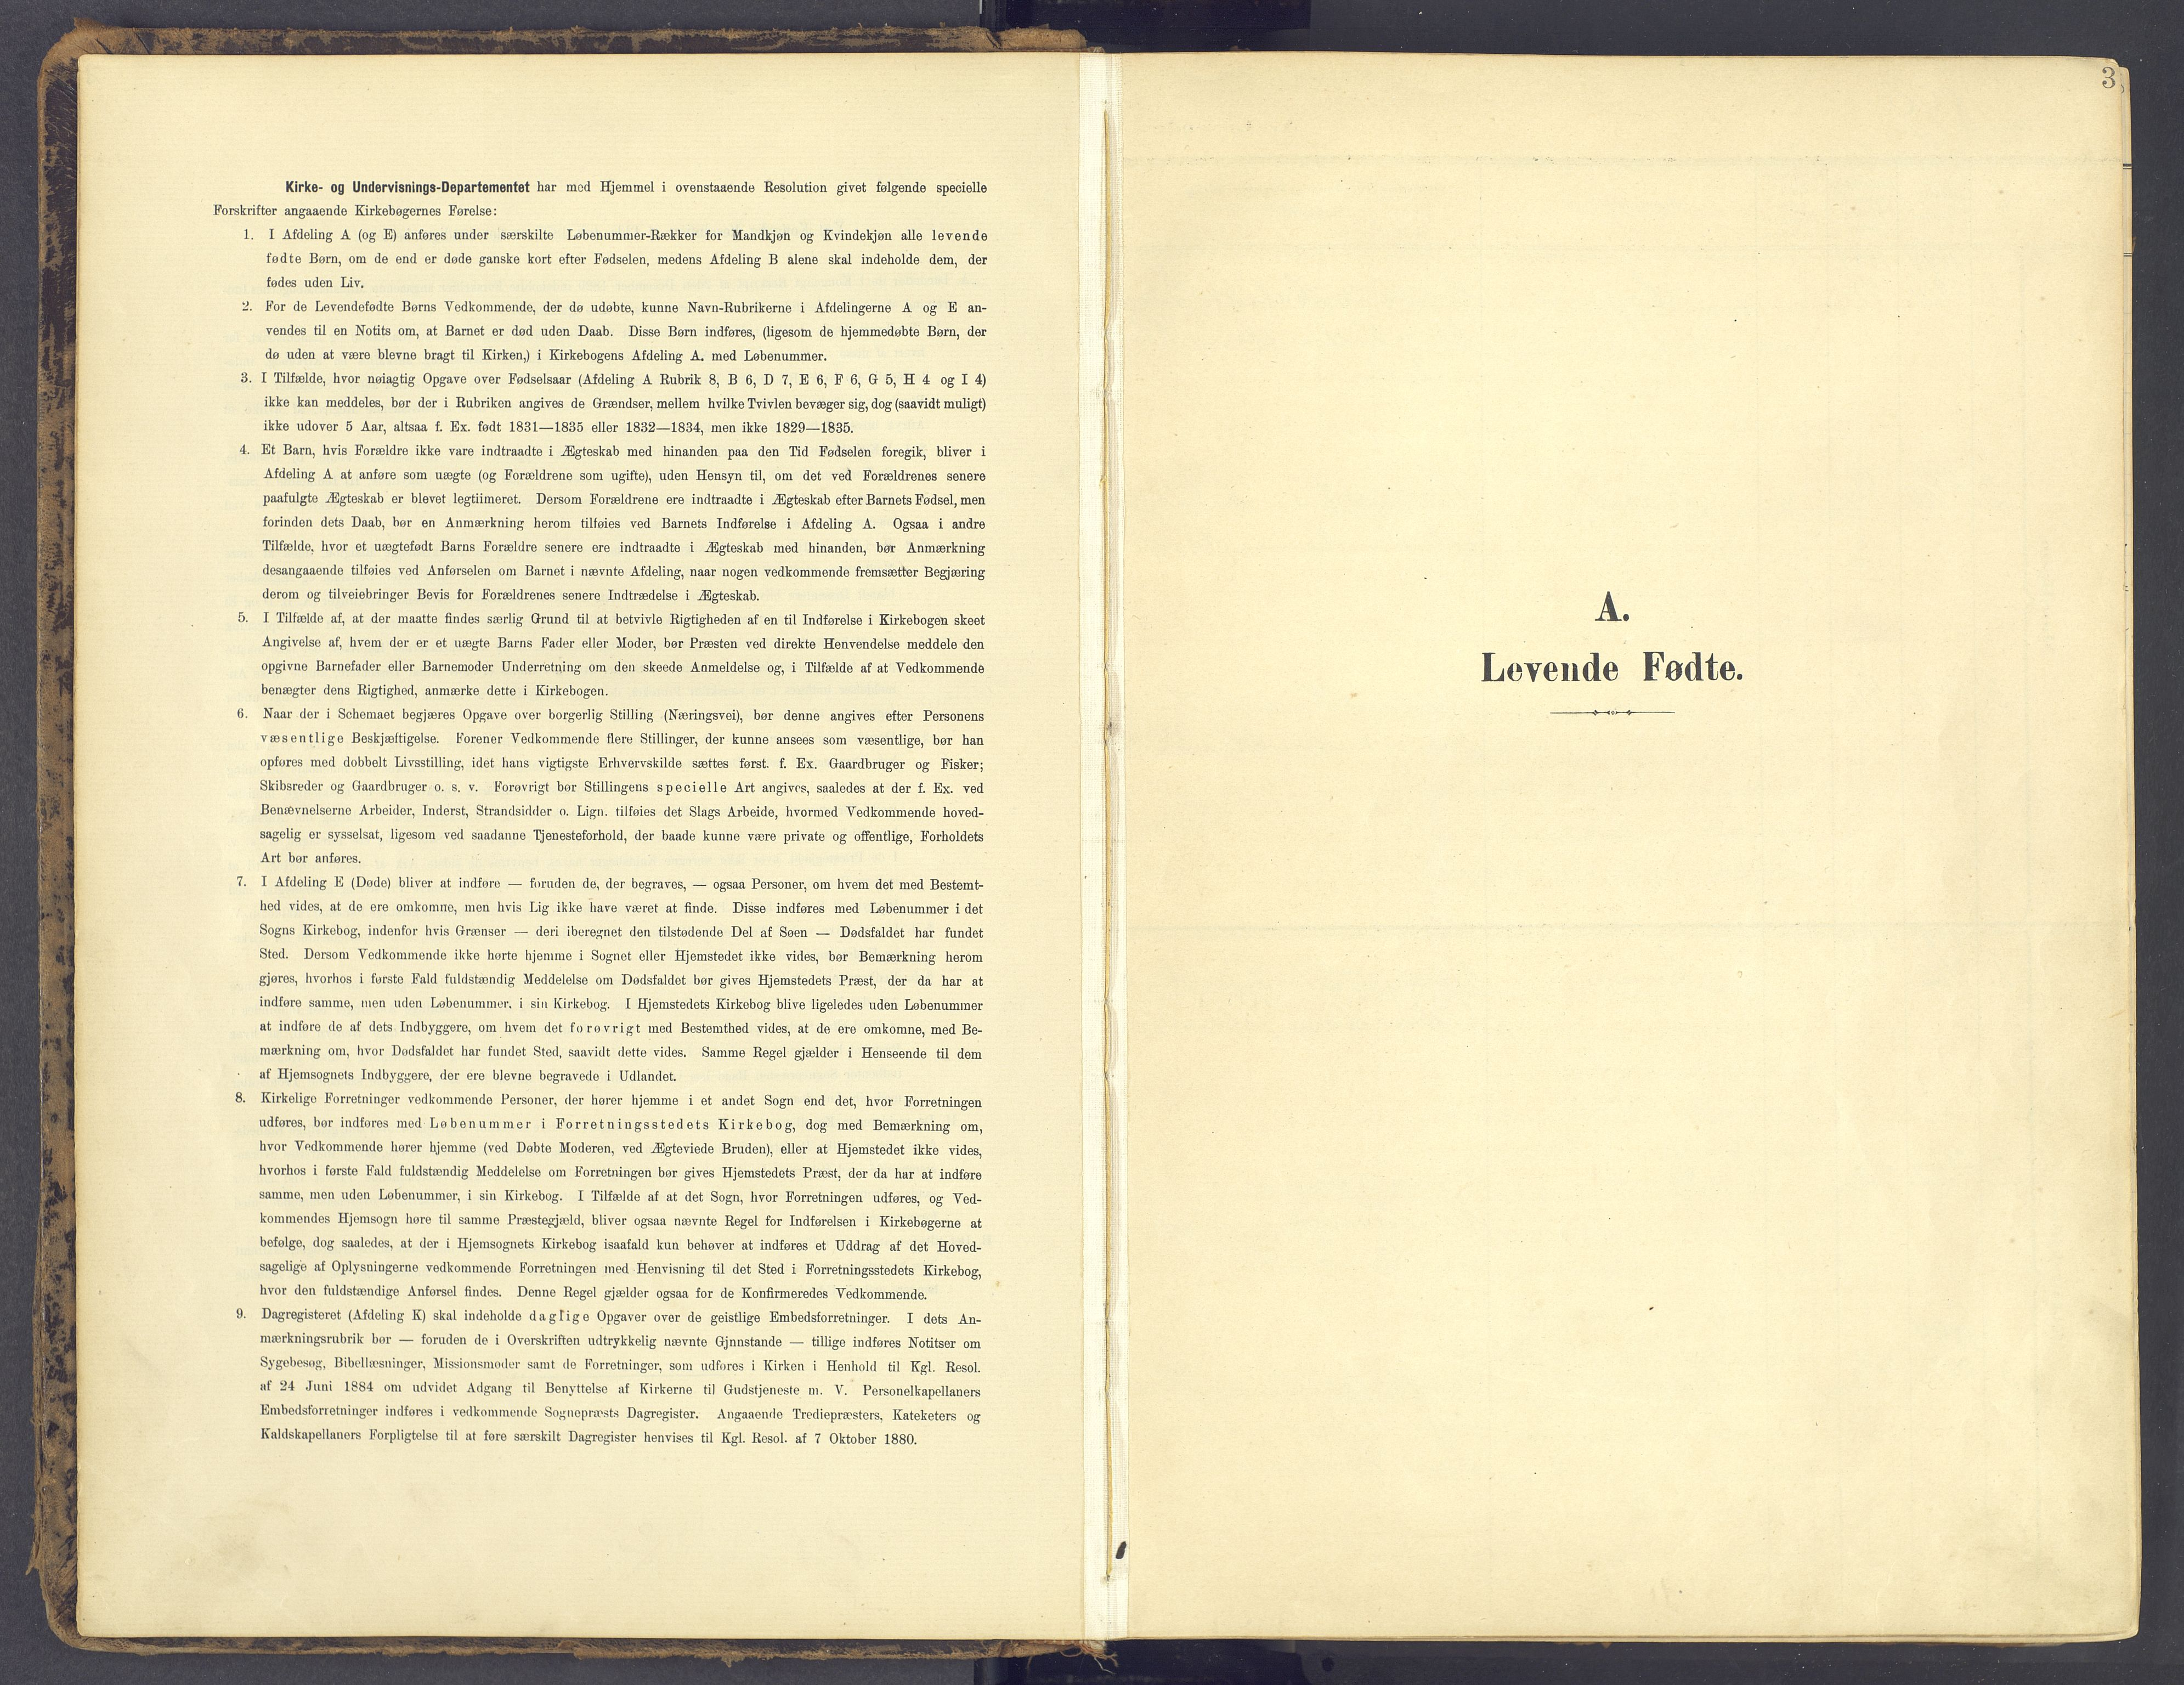 SAH, Fåberg prestekontor, Ministerialbok nr. 12, 1899-1915, s. 3